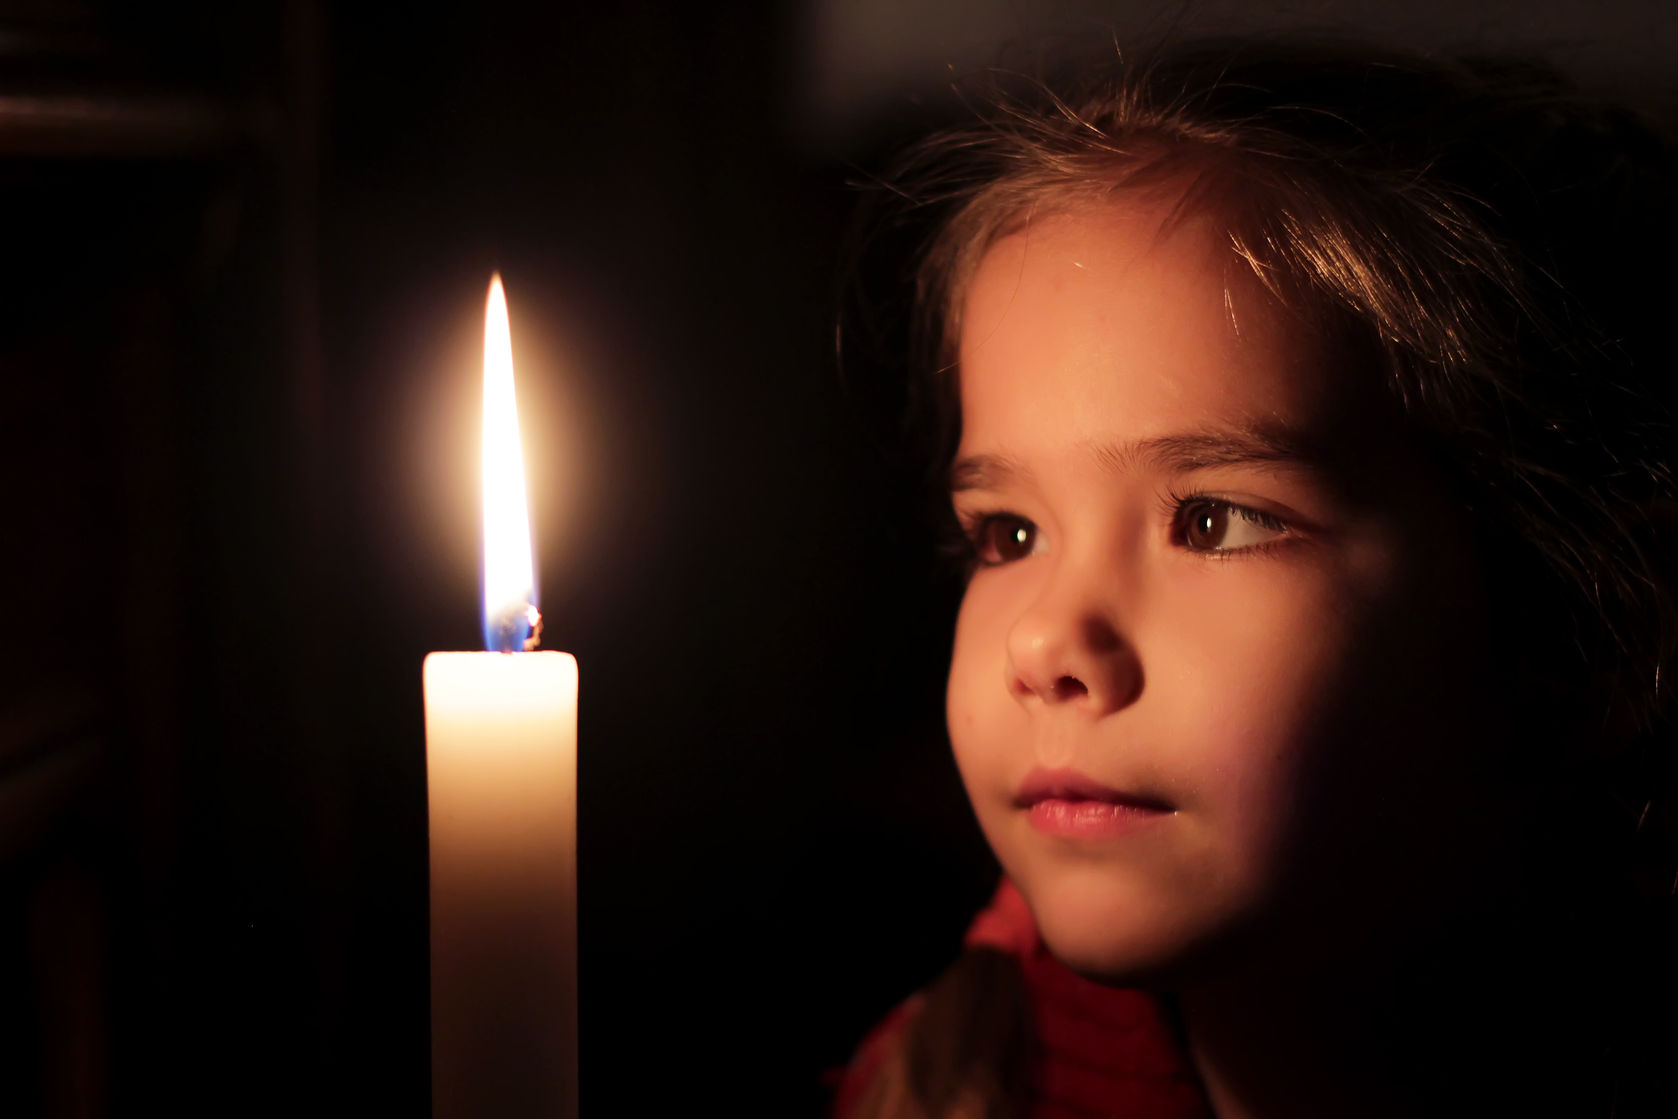 girl candle light.jpg